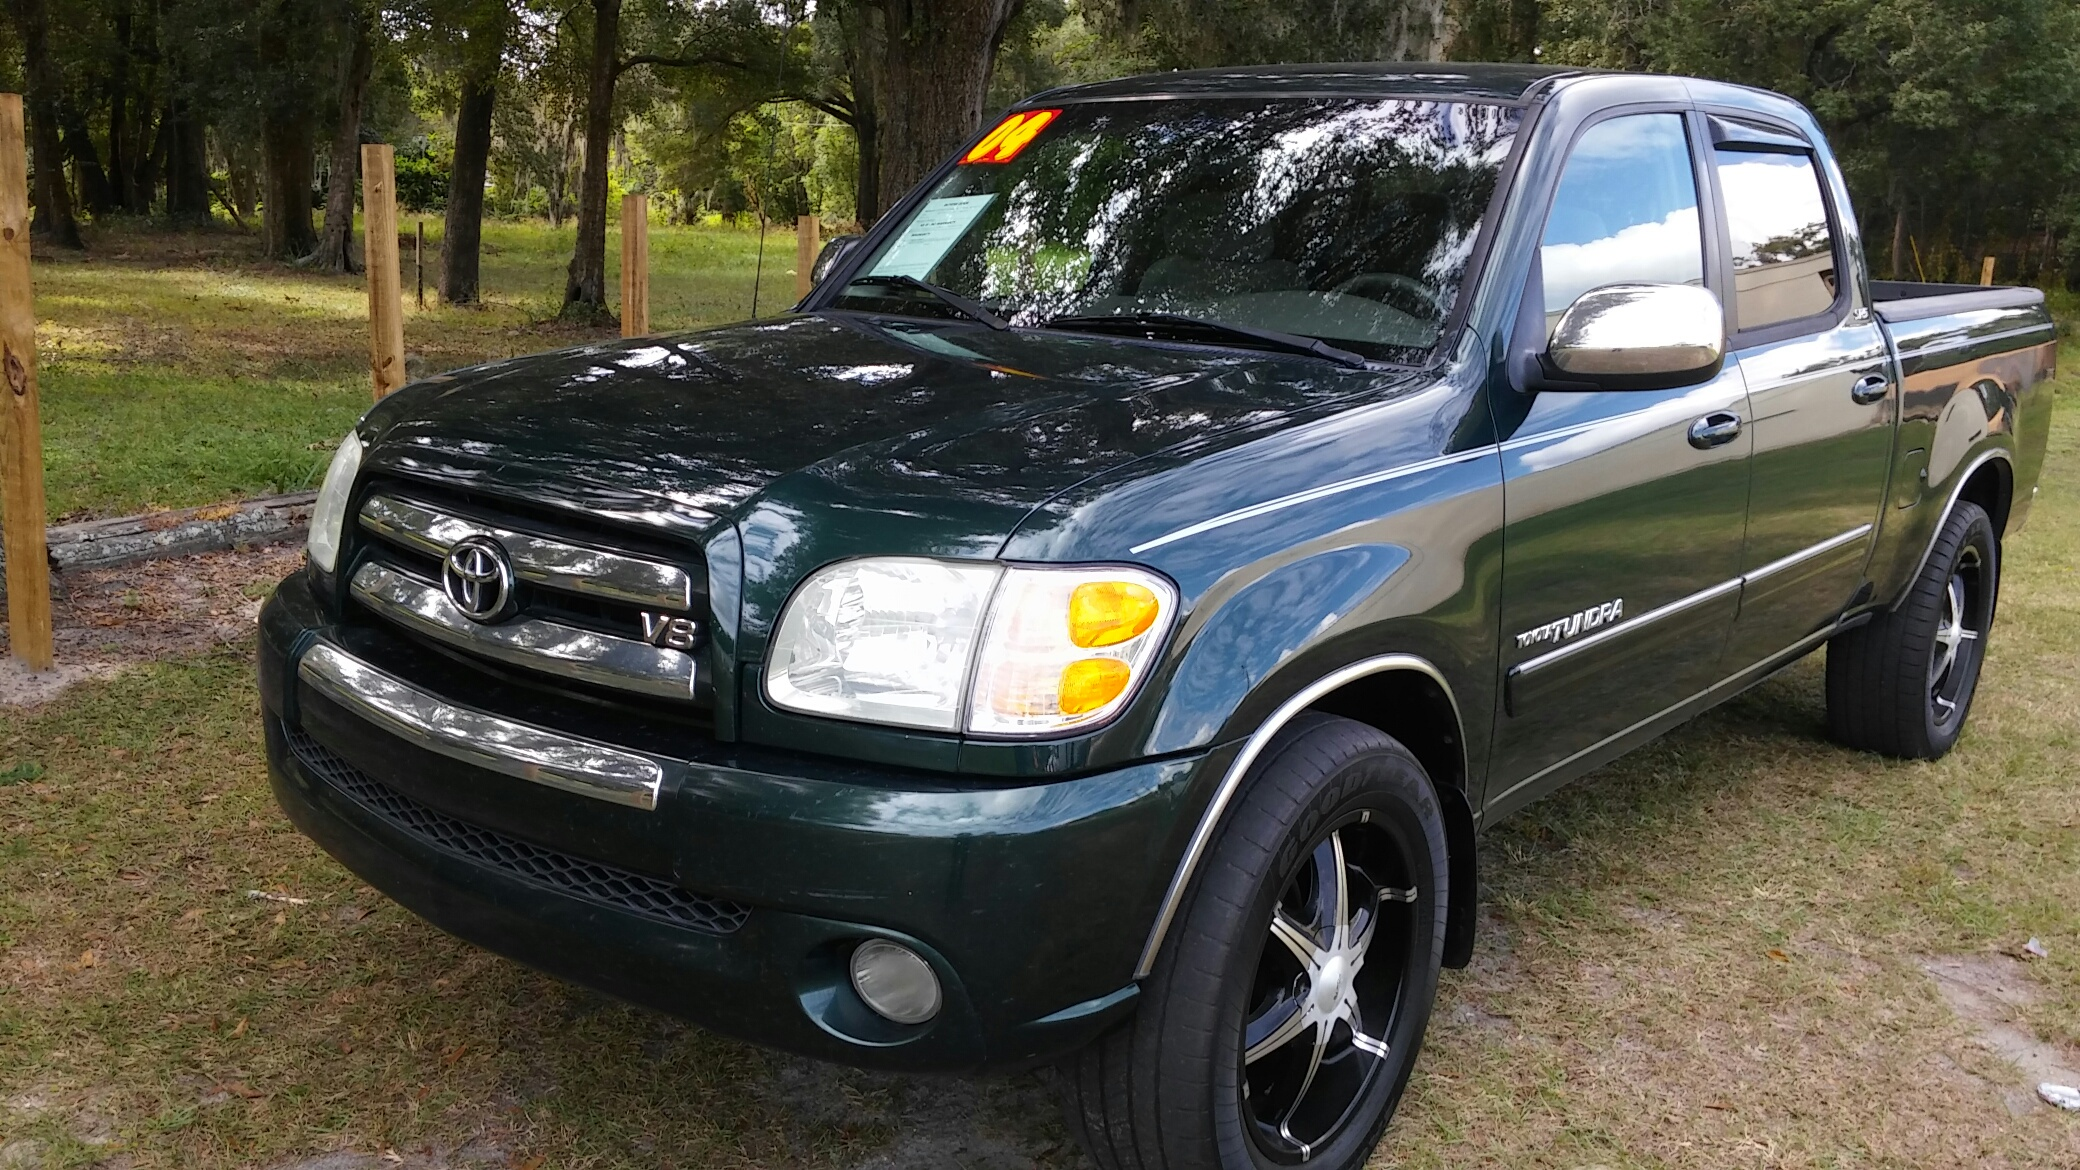 2004 Toyota Tundra $2,400.00 down